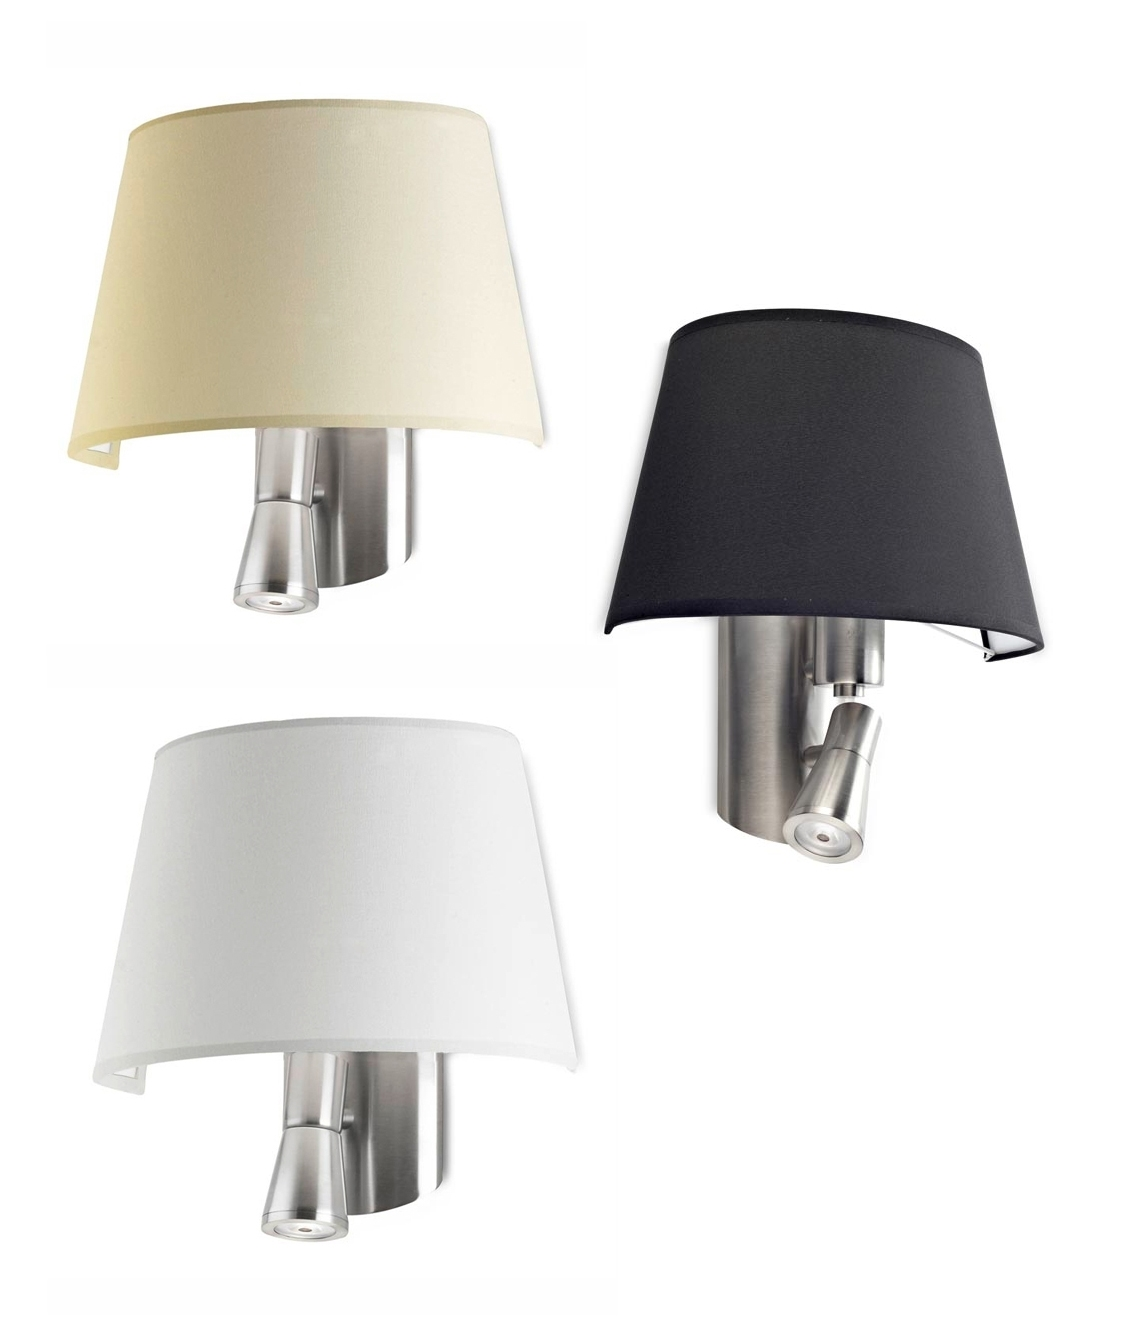 Satin Nickel Finish LED Bedside Reading Light - Three ...